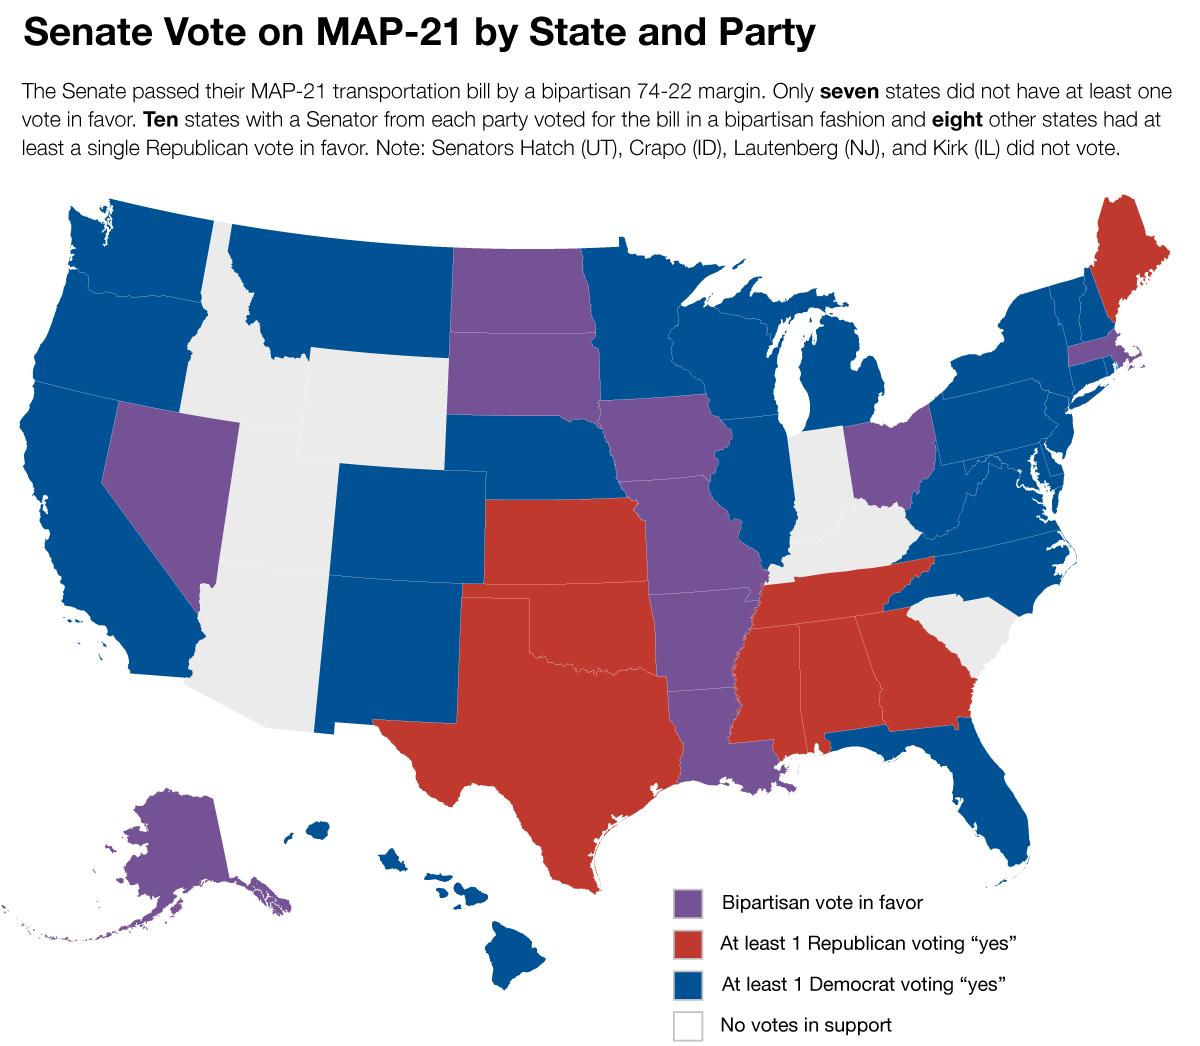 Us Senate Map 2012 Transportation For America Graphic: A closer look at the Senate